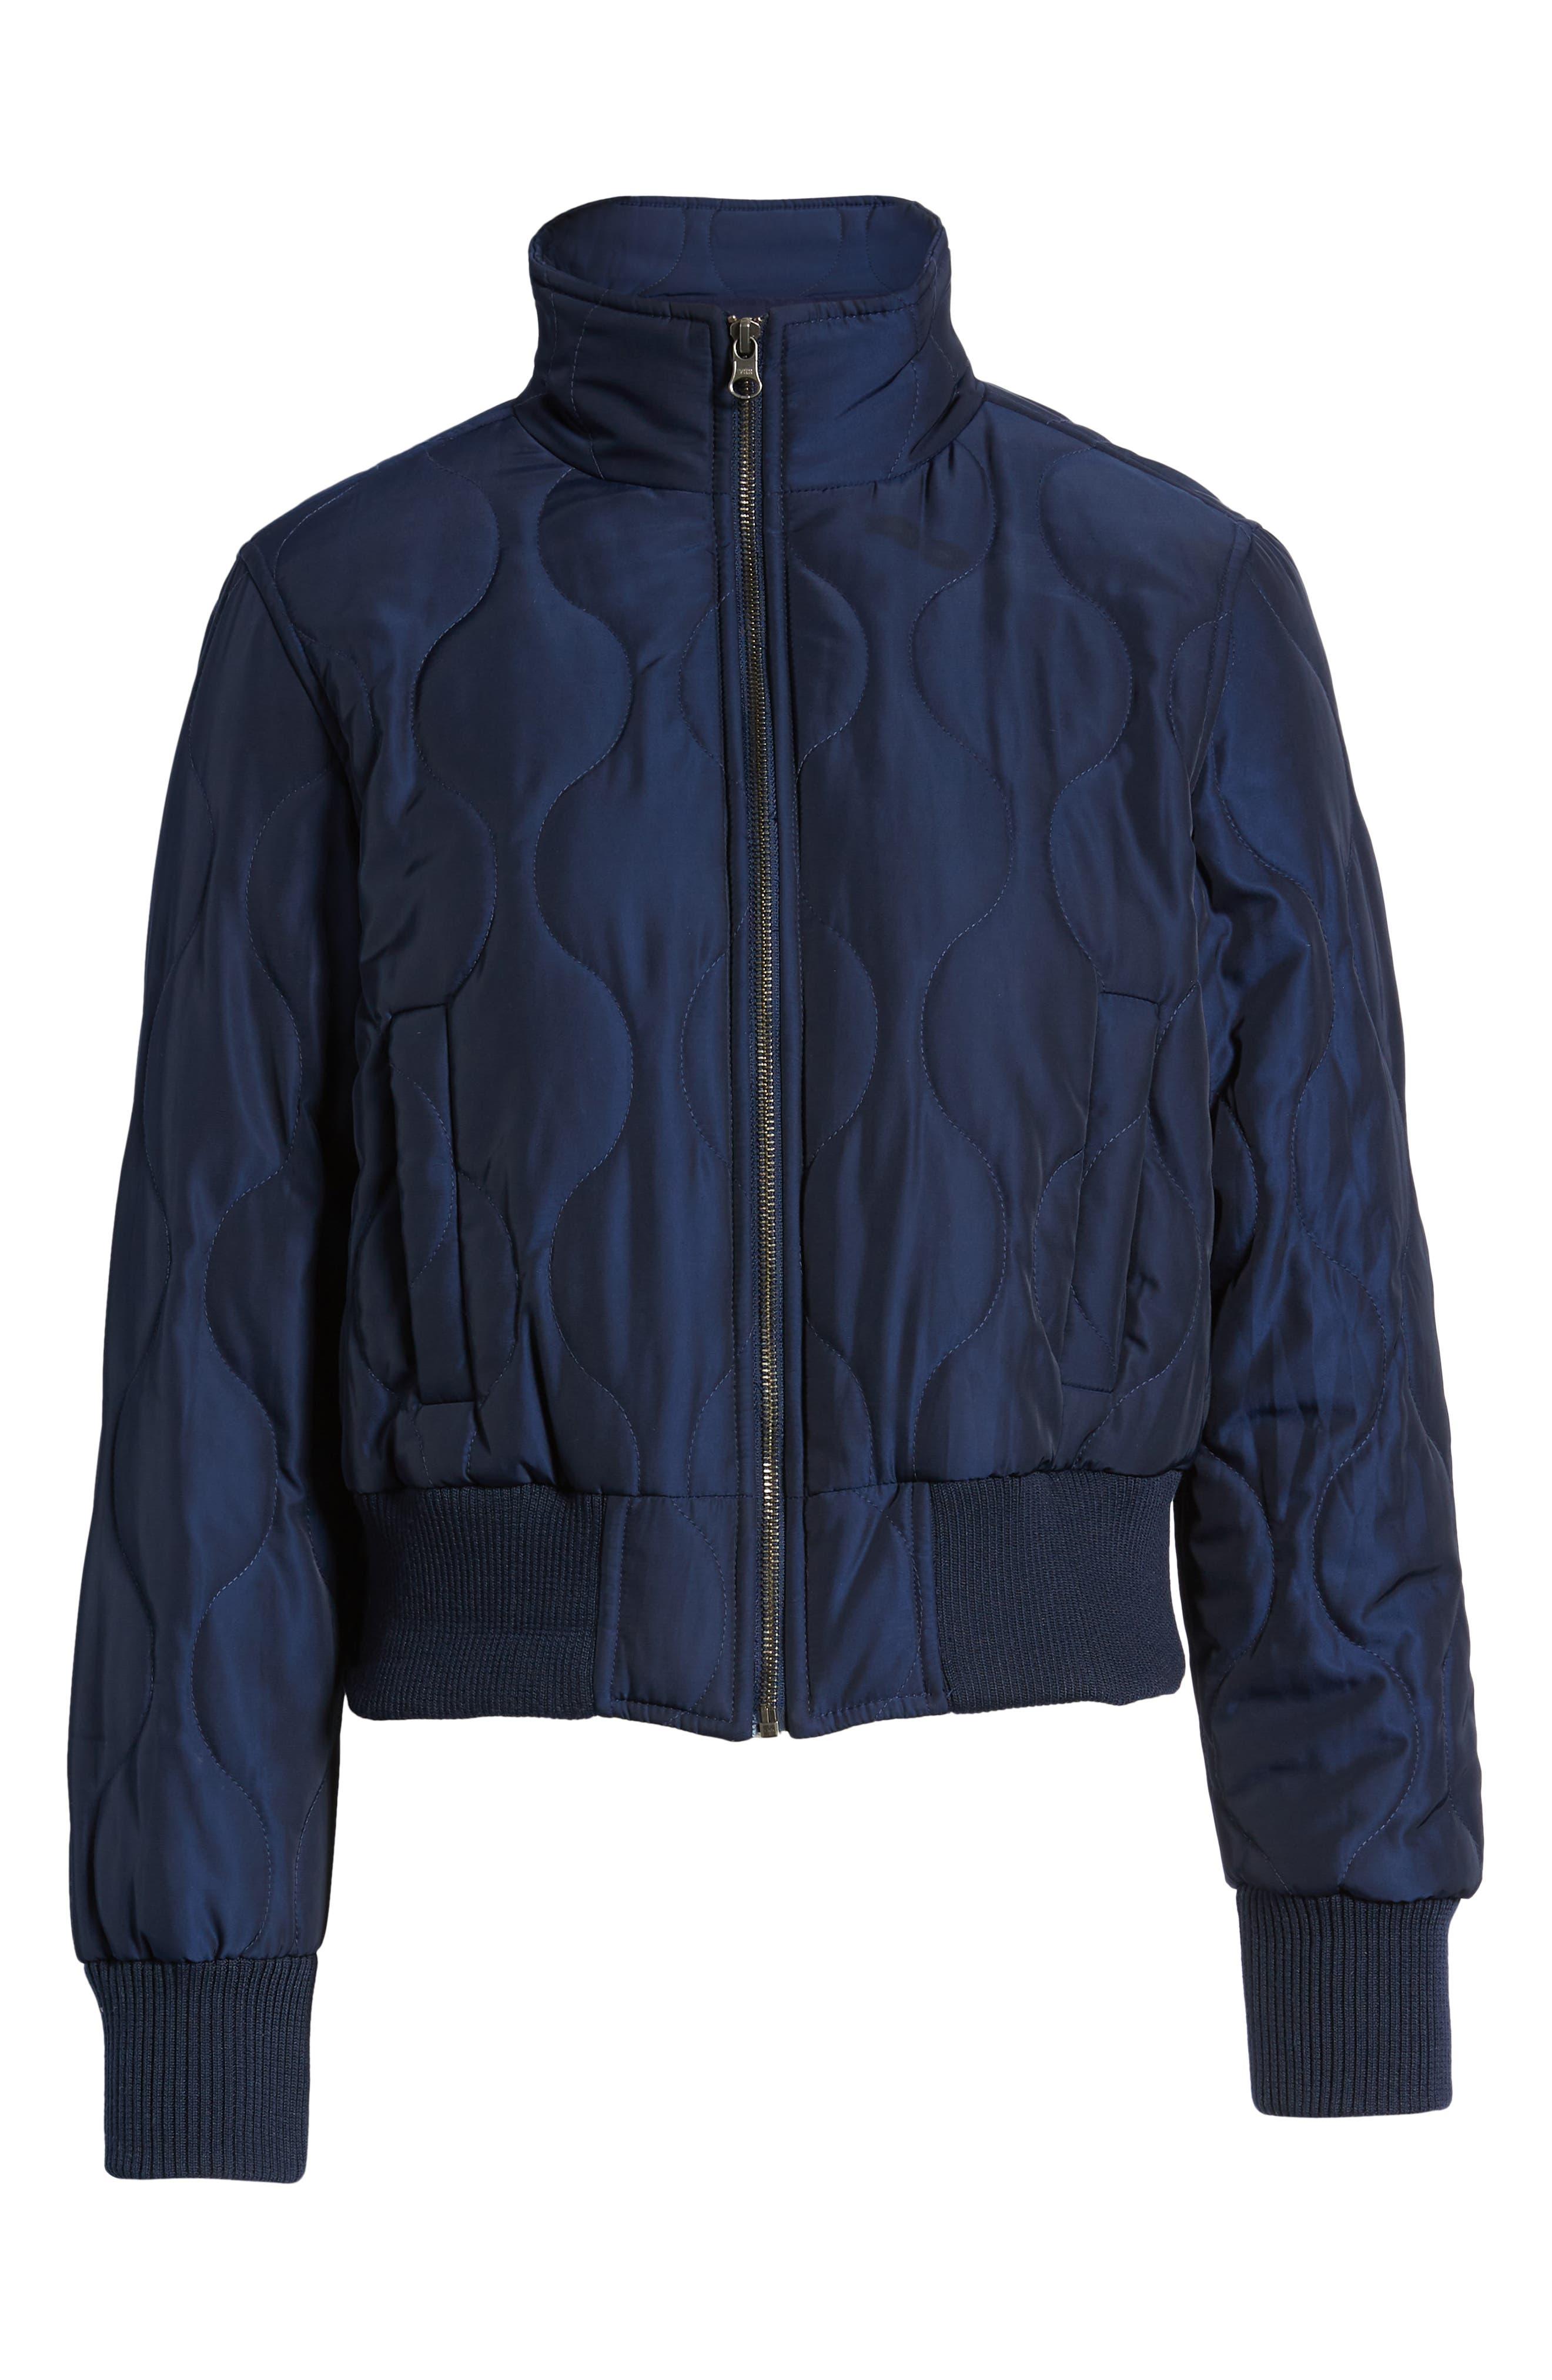 TREASURE & BOND, Satin Crop Puffer Jacket, Alternate thumbnail 6, color, NAVY MARITIME